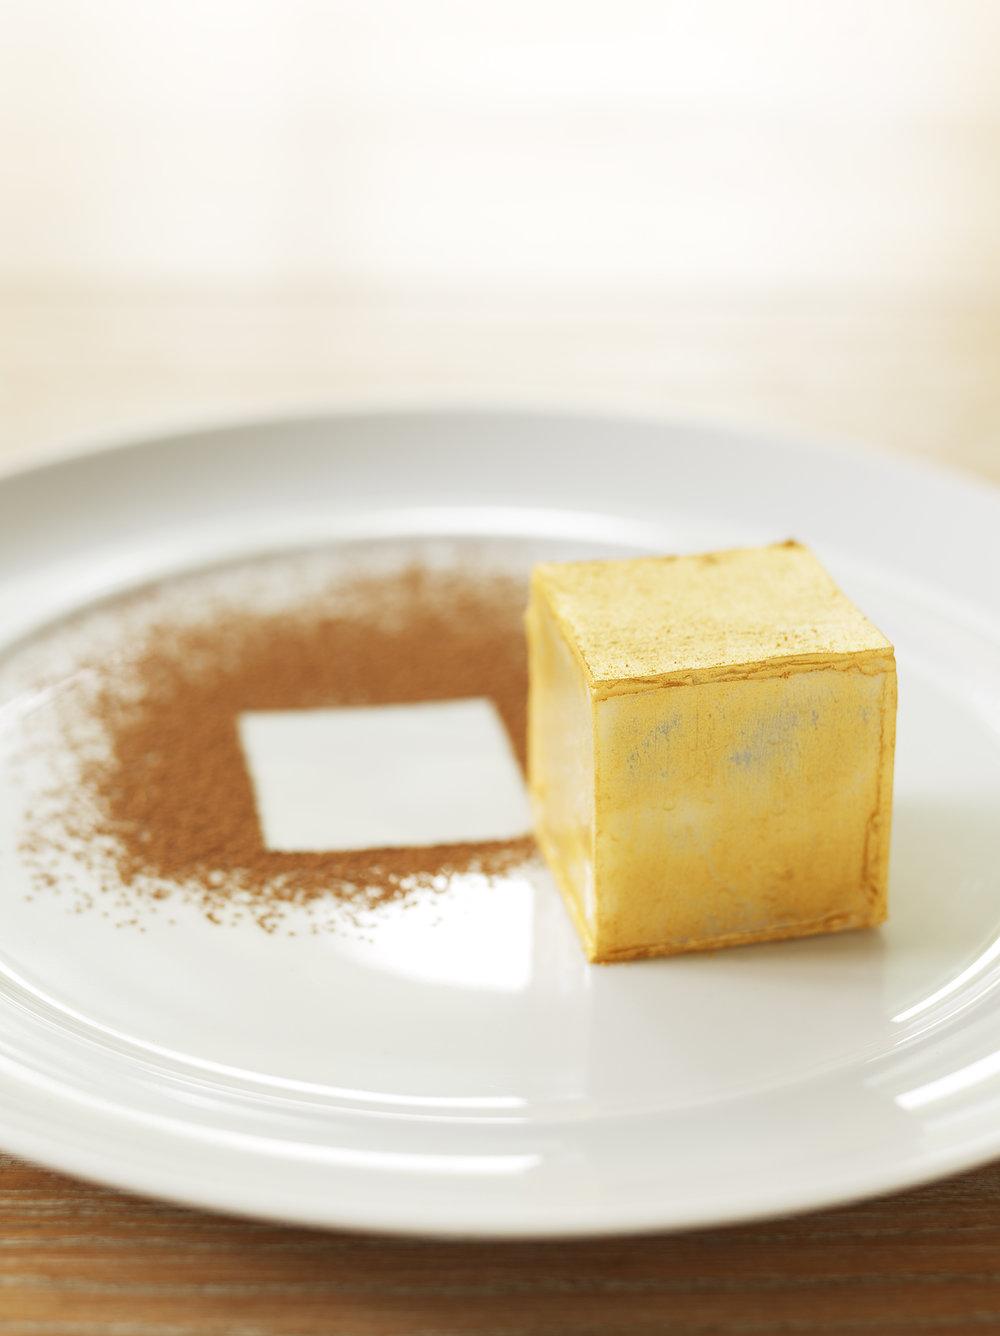 Food_1_00014_w1.jpg